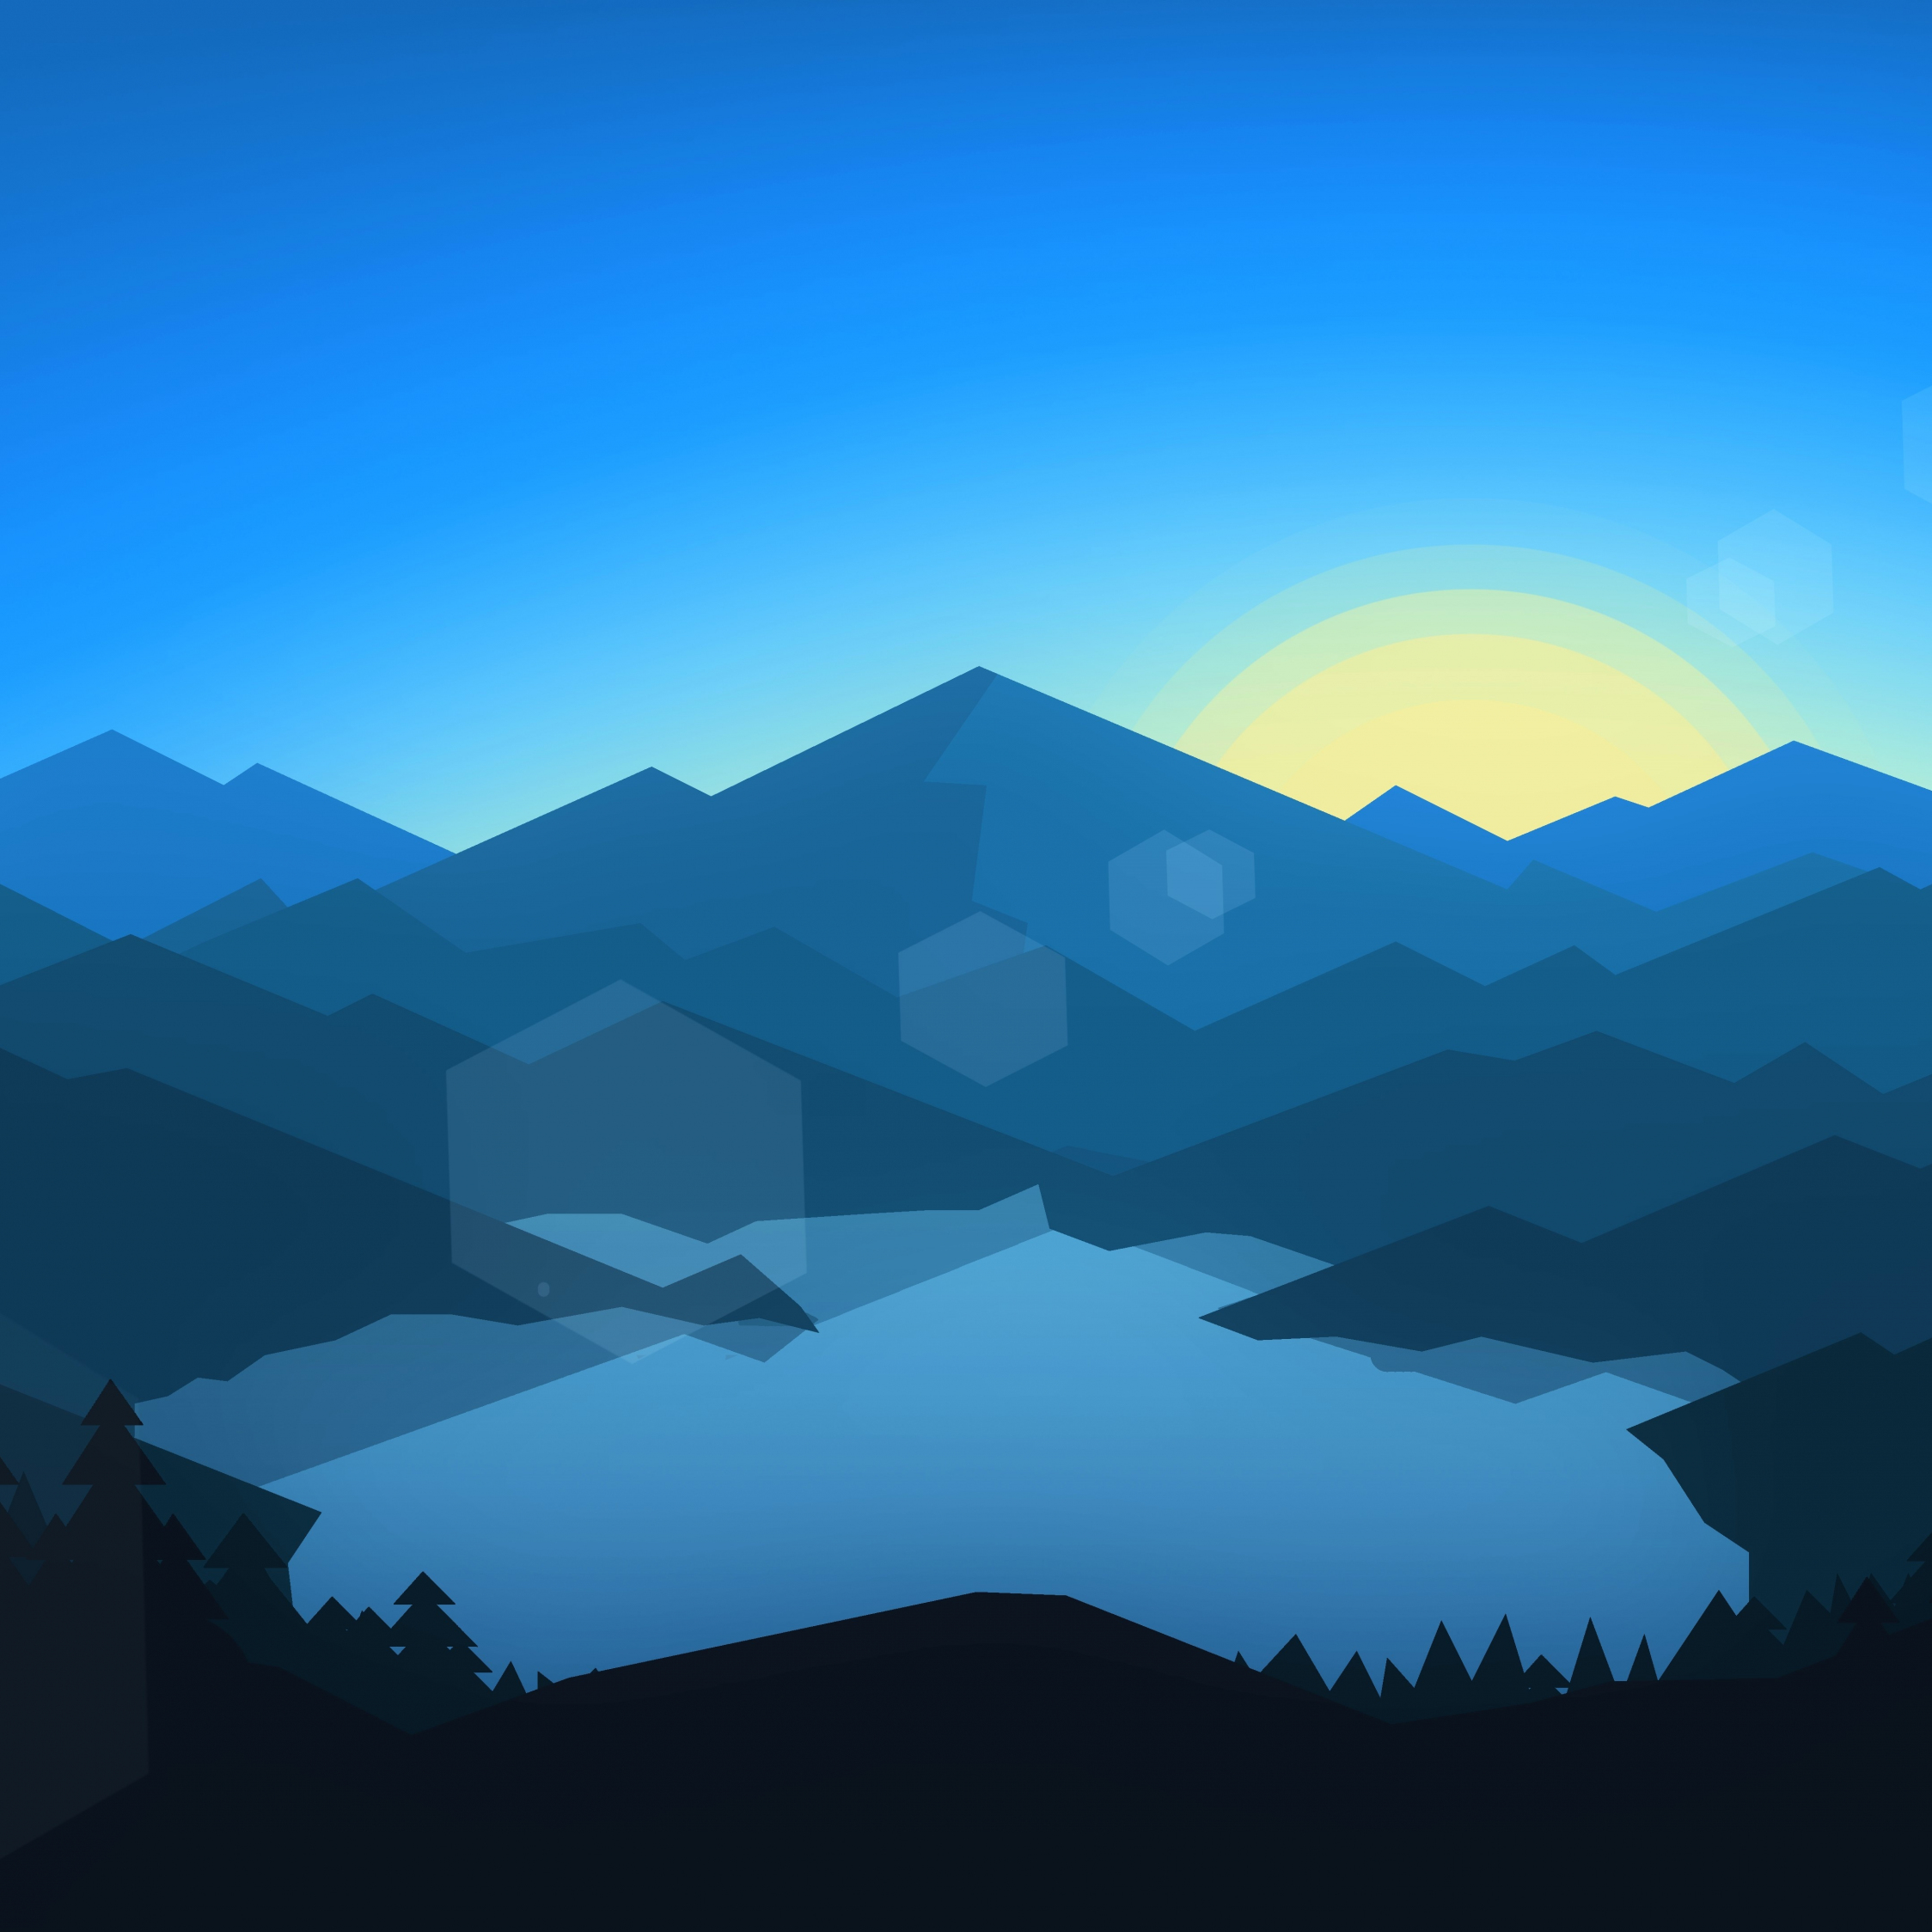 Beautiful Wallpaper Mountain Ipad Mini - forest_mountains_sunset_cool_weather_minimalism  Image_773425.jpg